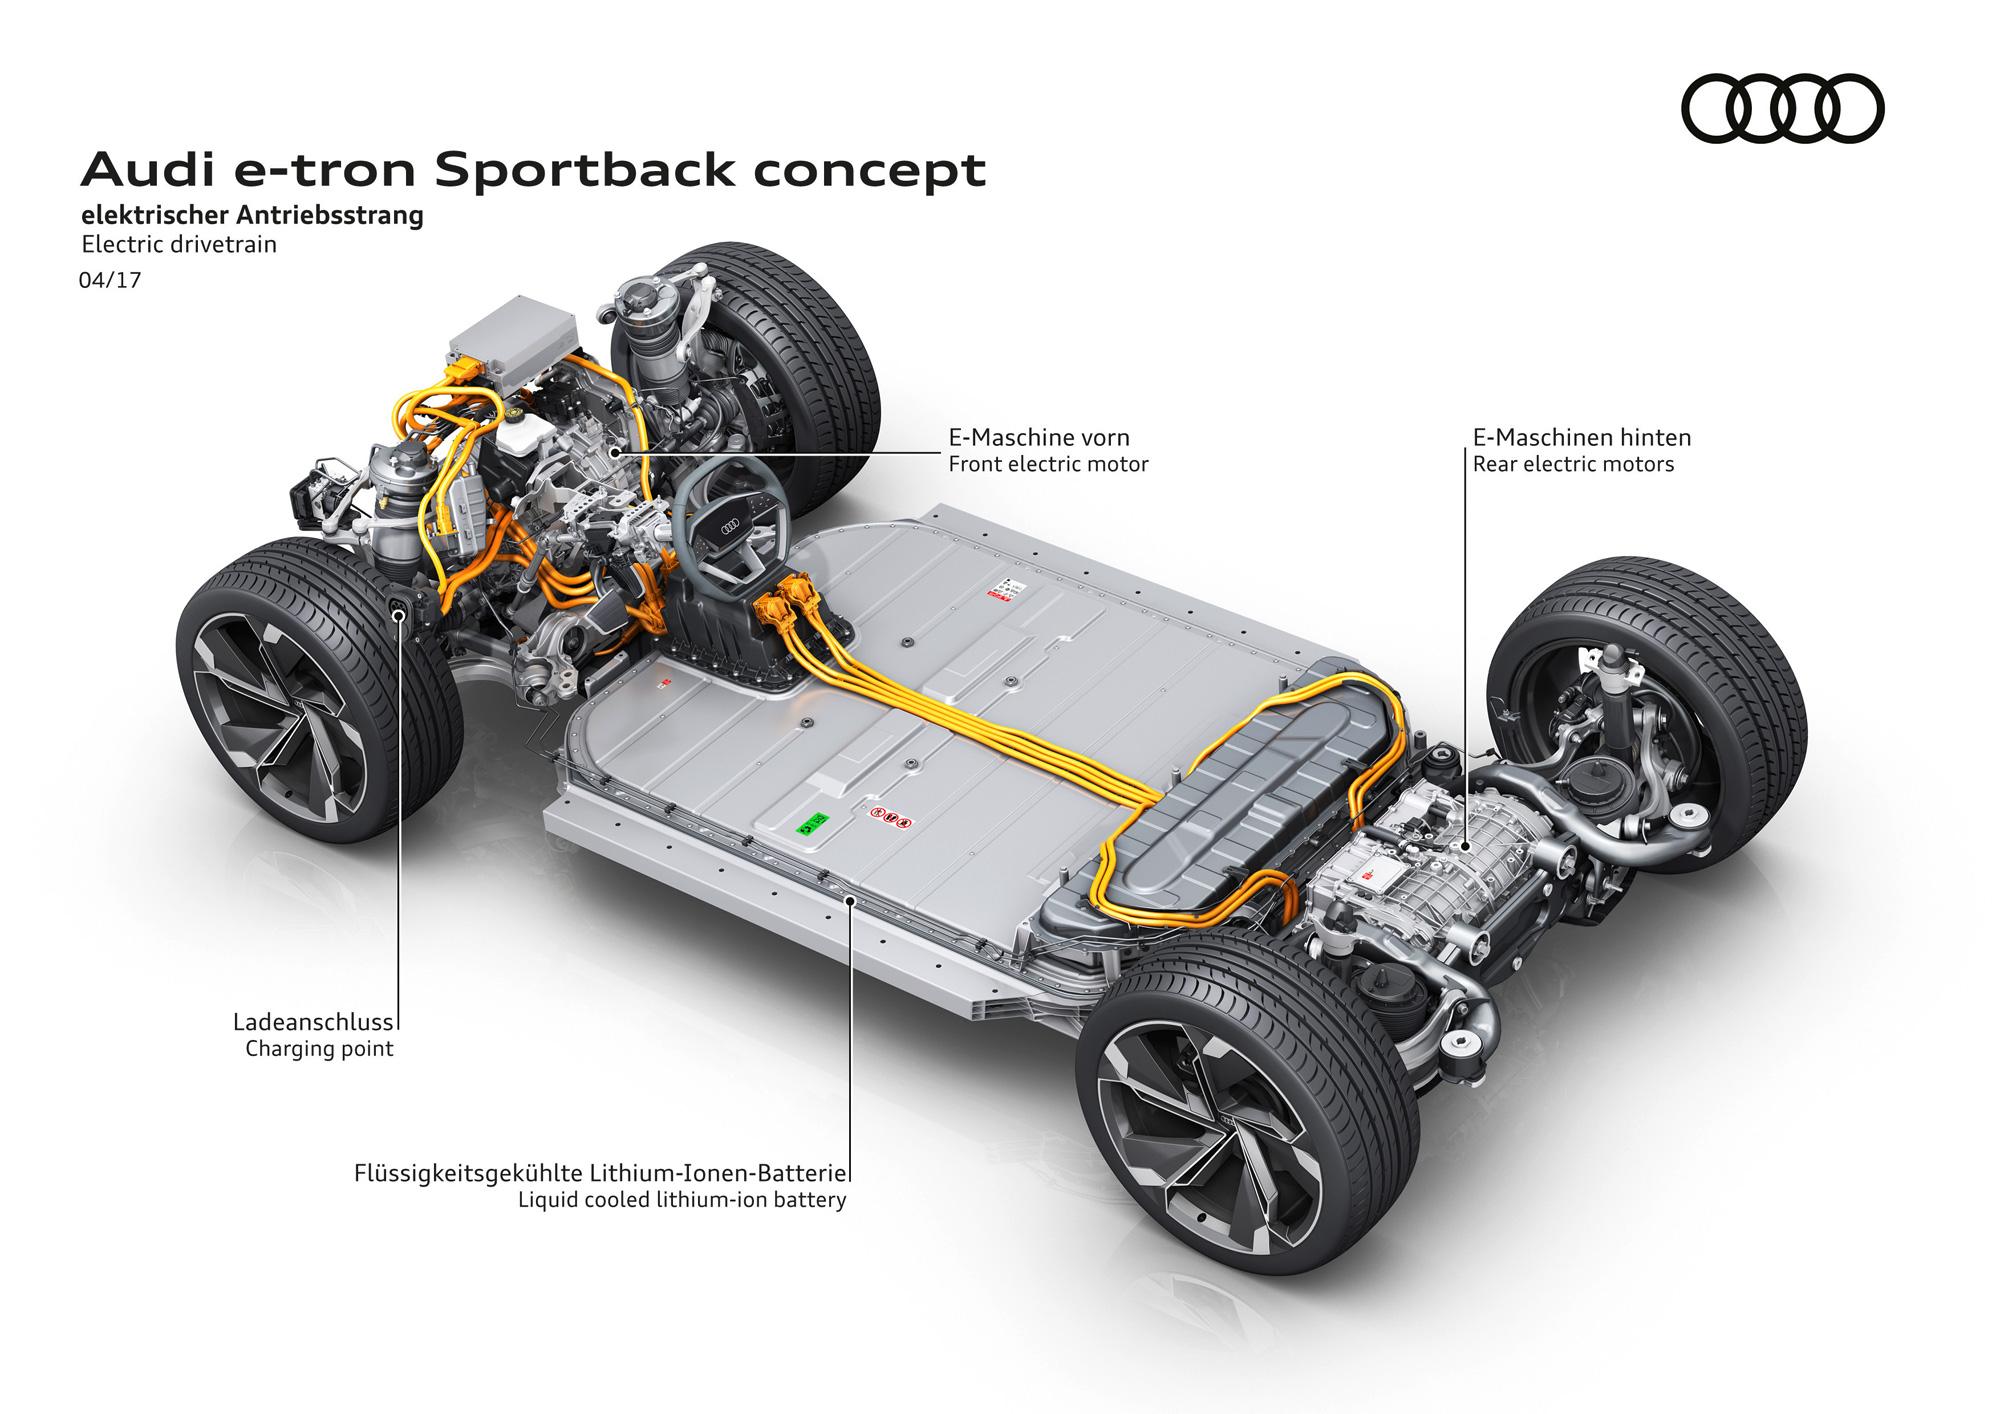 Audi e-tron Sportsback concept